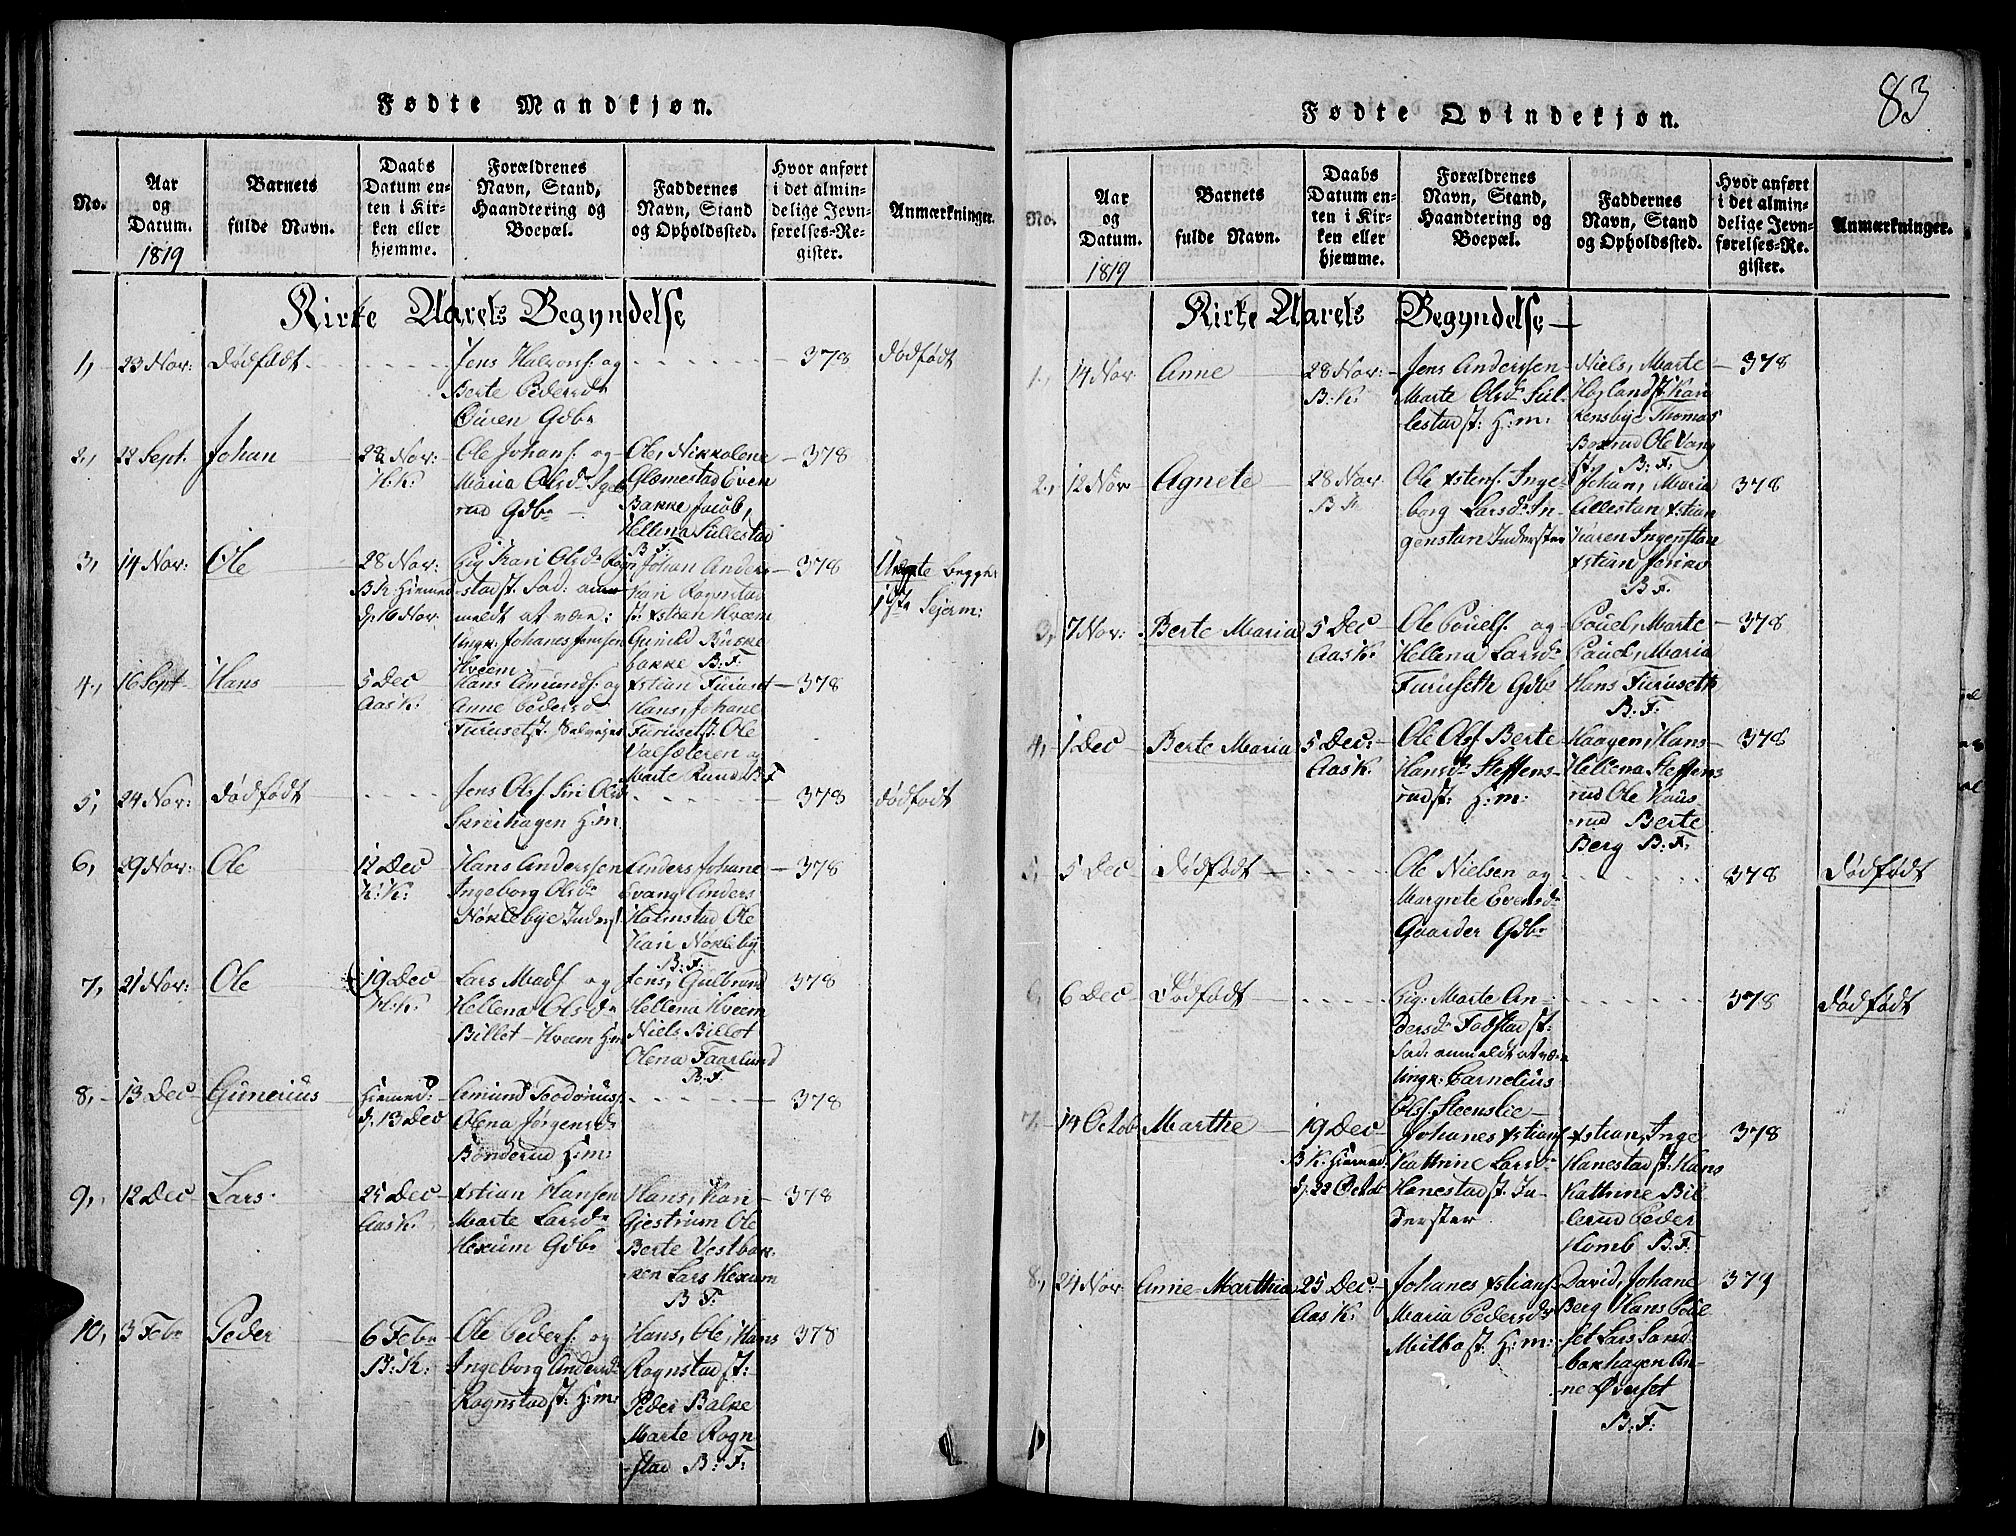 SAH, Toten prestekontor, Ministerialbok nr. 9, 1814-1820, s. 83